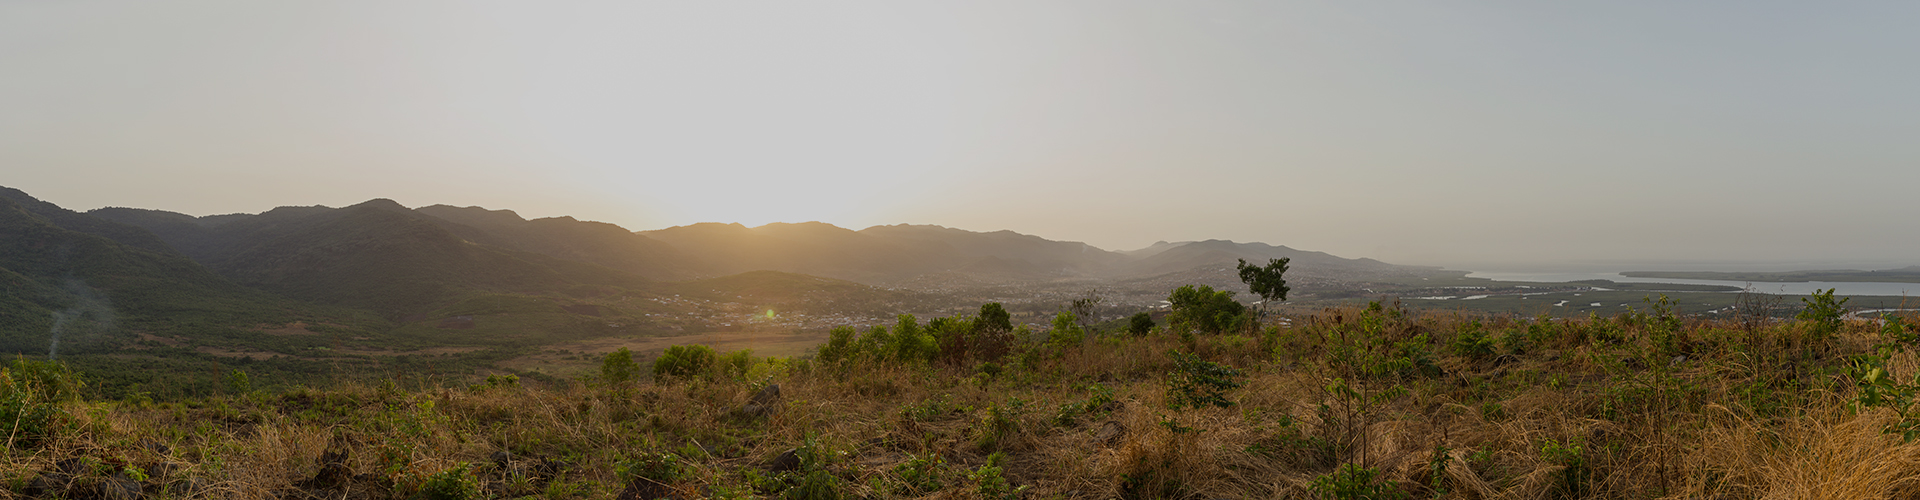 Landmark photograph of Sierra Leone